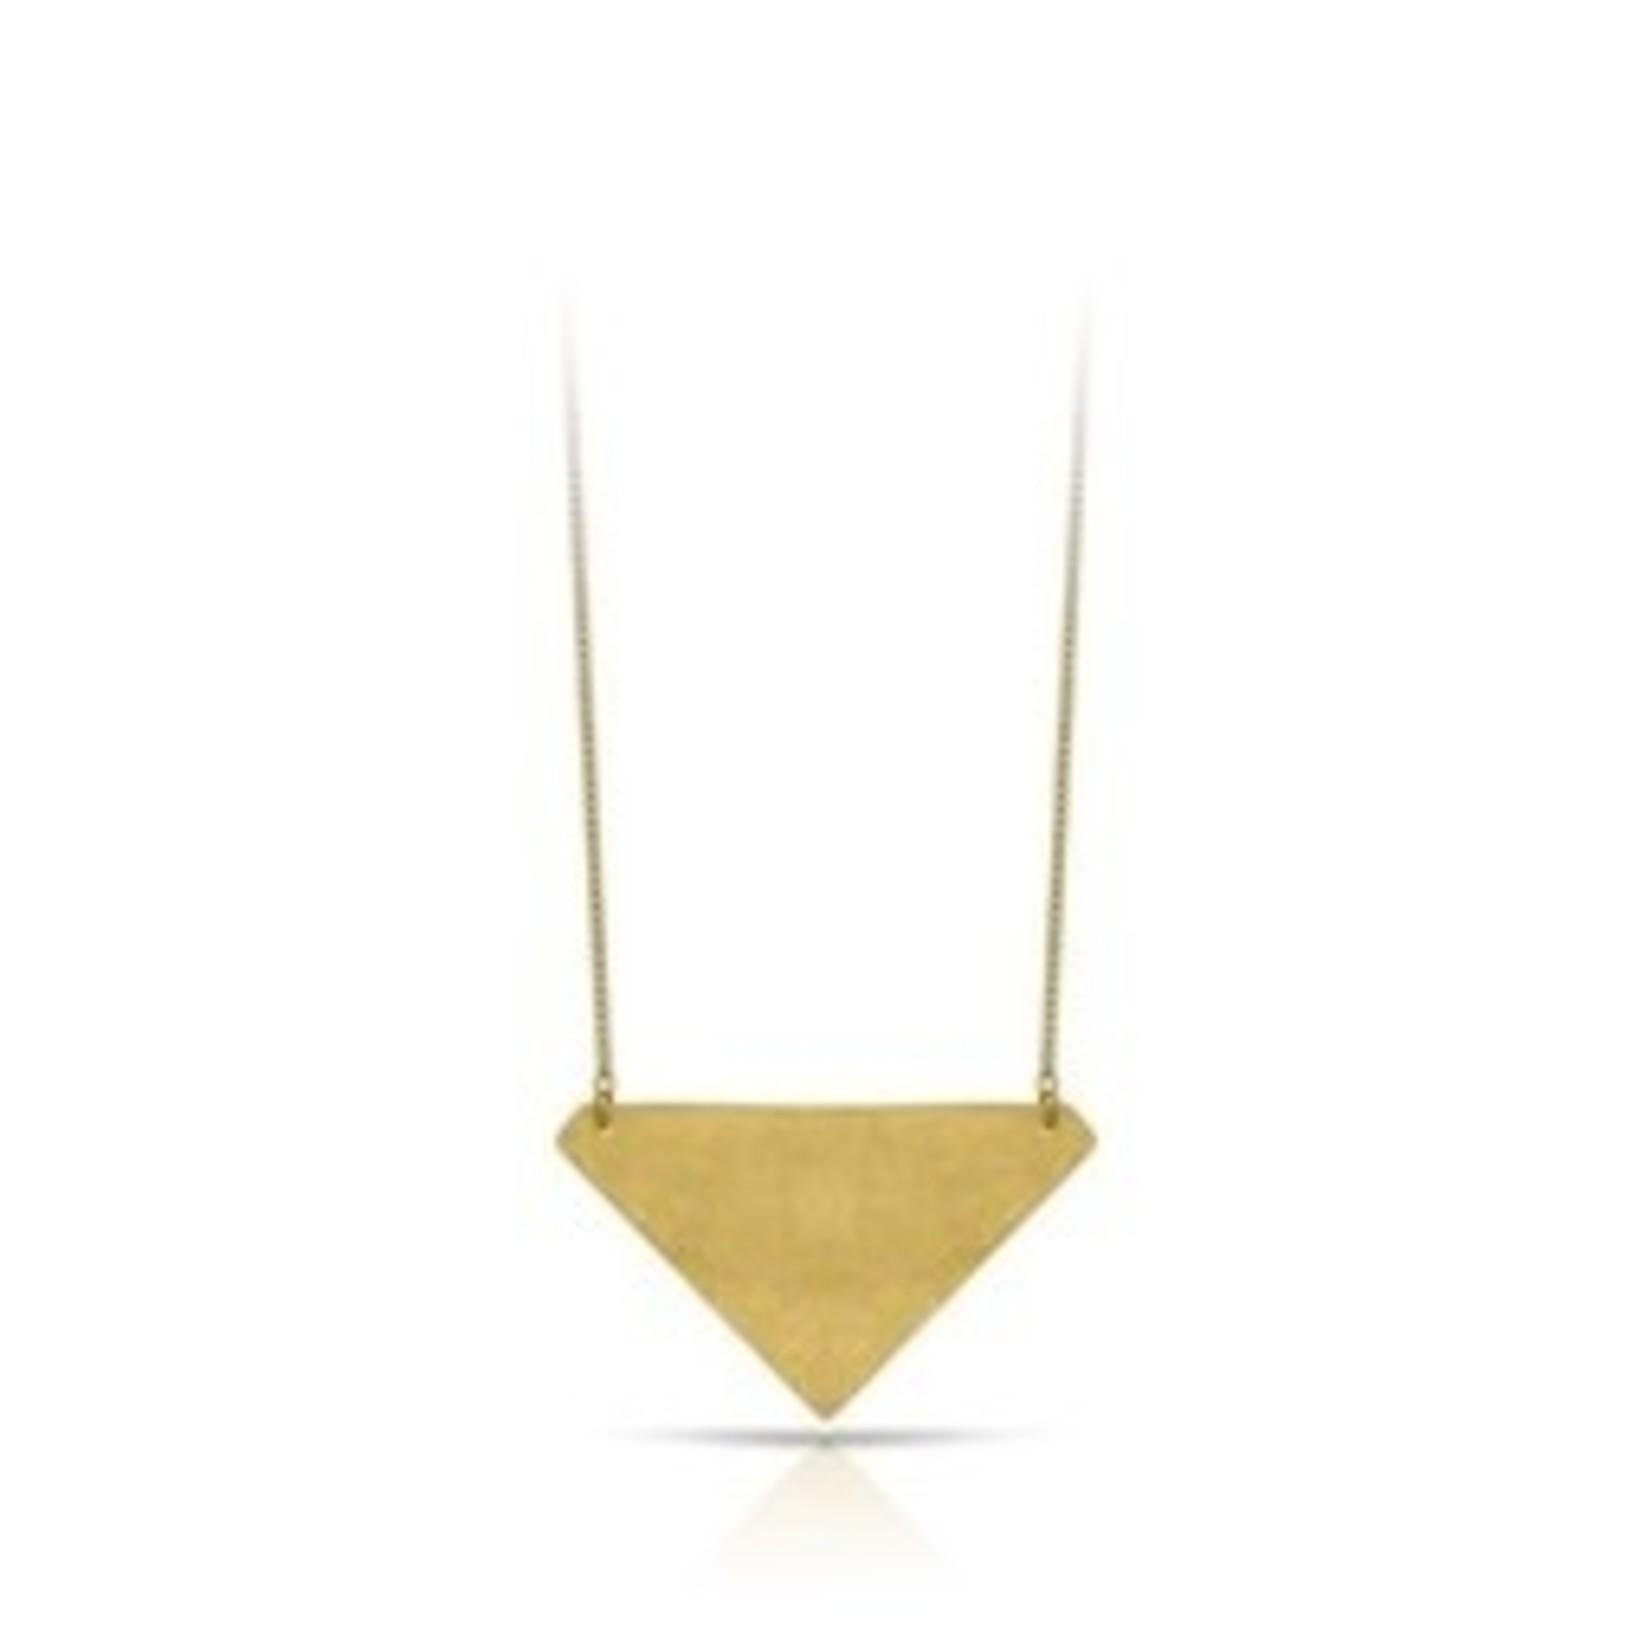 Inimini Homemade Ketting - Brass - Triangle